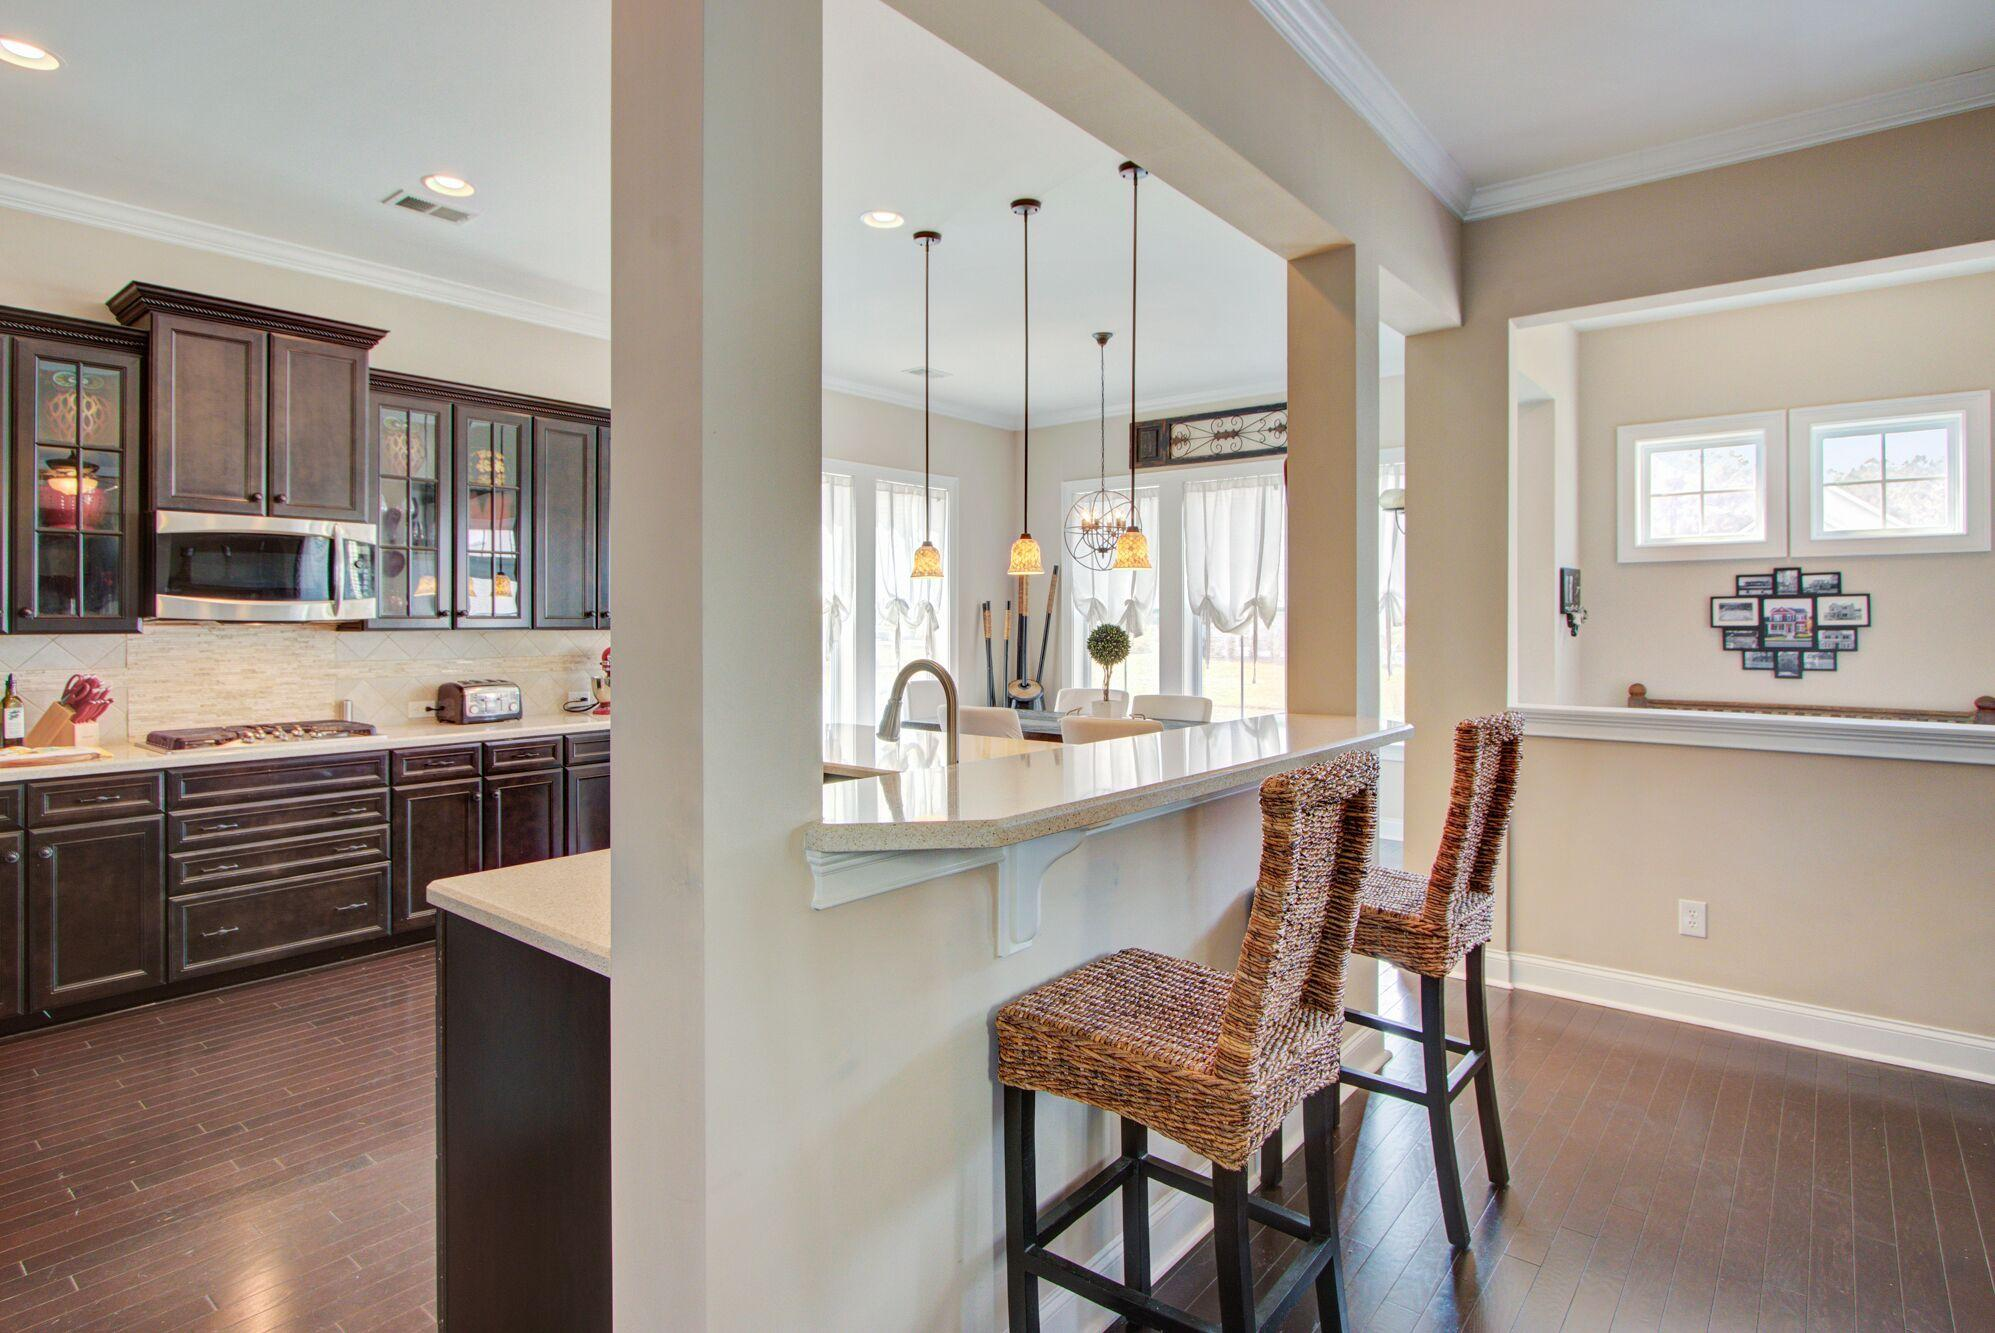 Carolina Park Homes For Sale - 3614 Shutesbury, Mount Pleasant, SC - 29